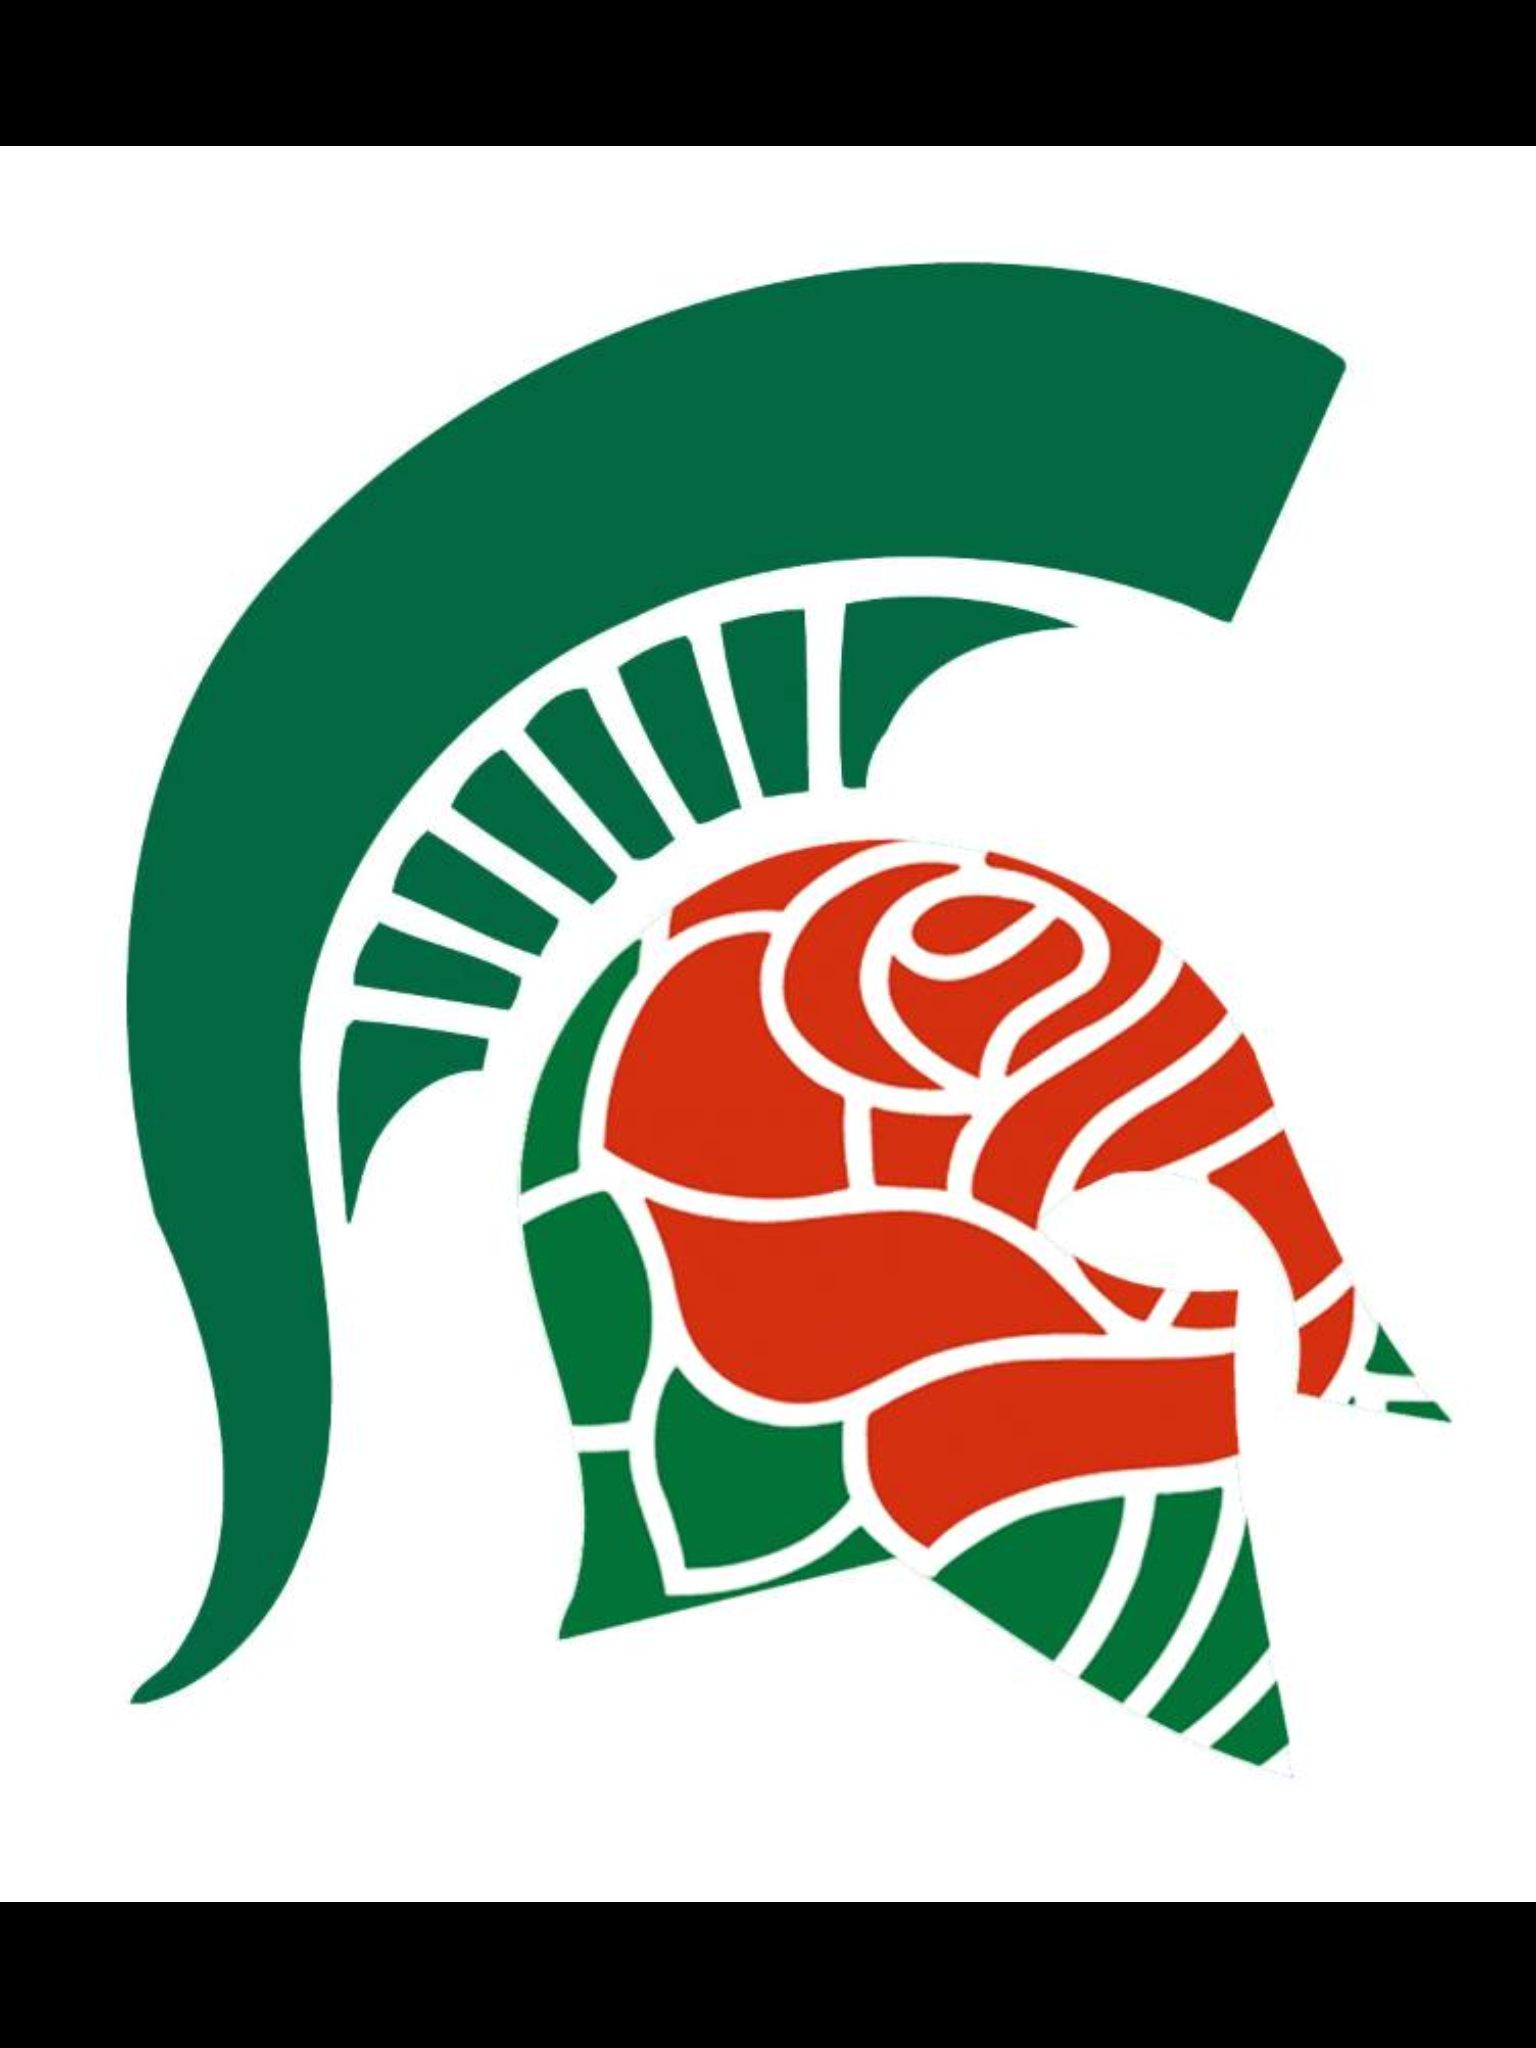 Spartan Rose Bowl Helmet Logo Michigan State Football Michigan State Spartans Michigan State